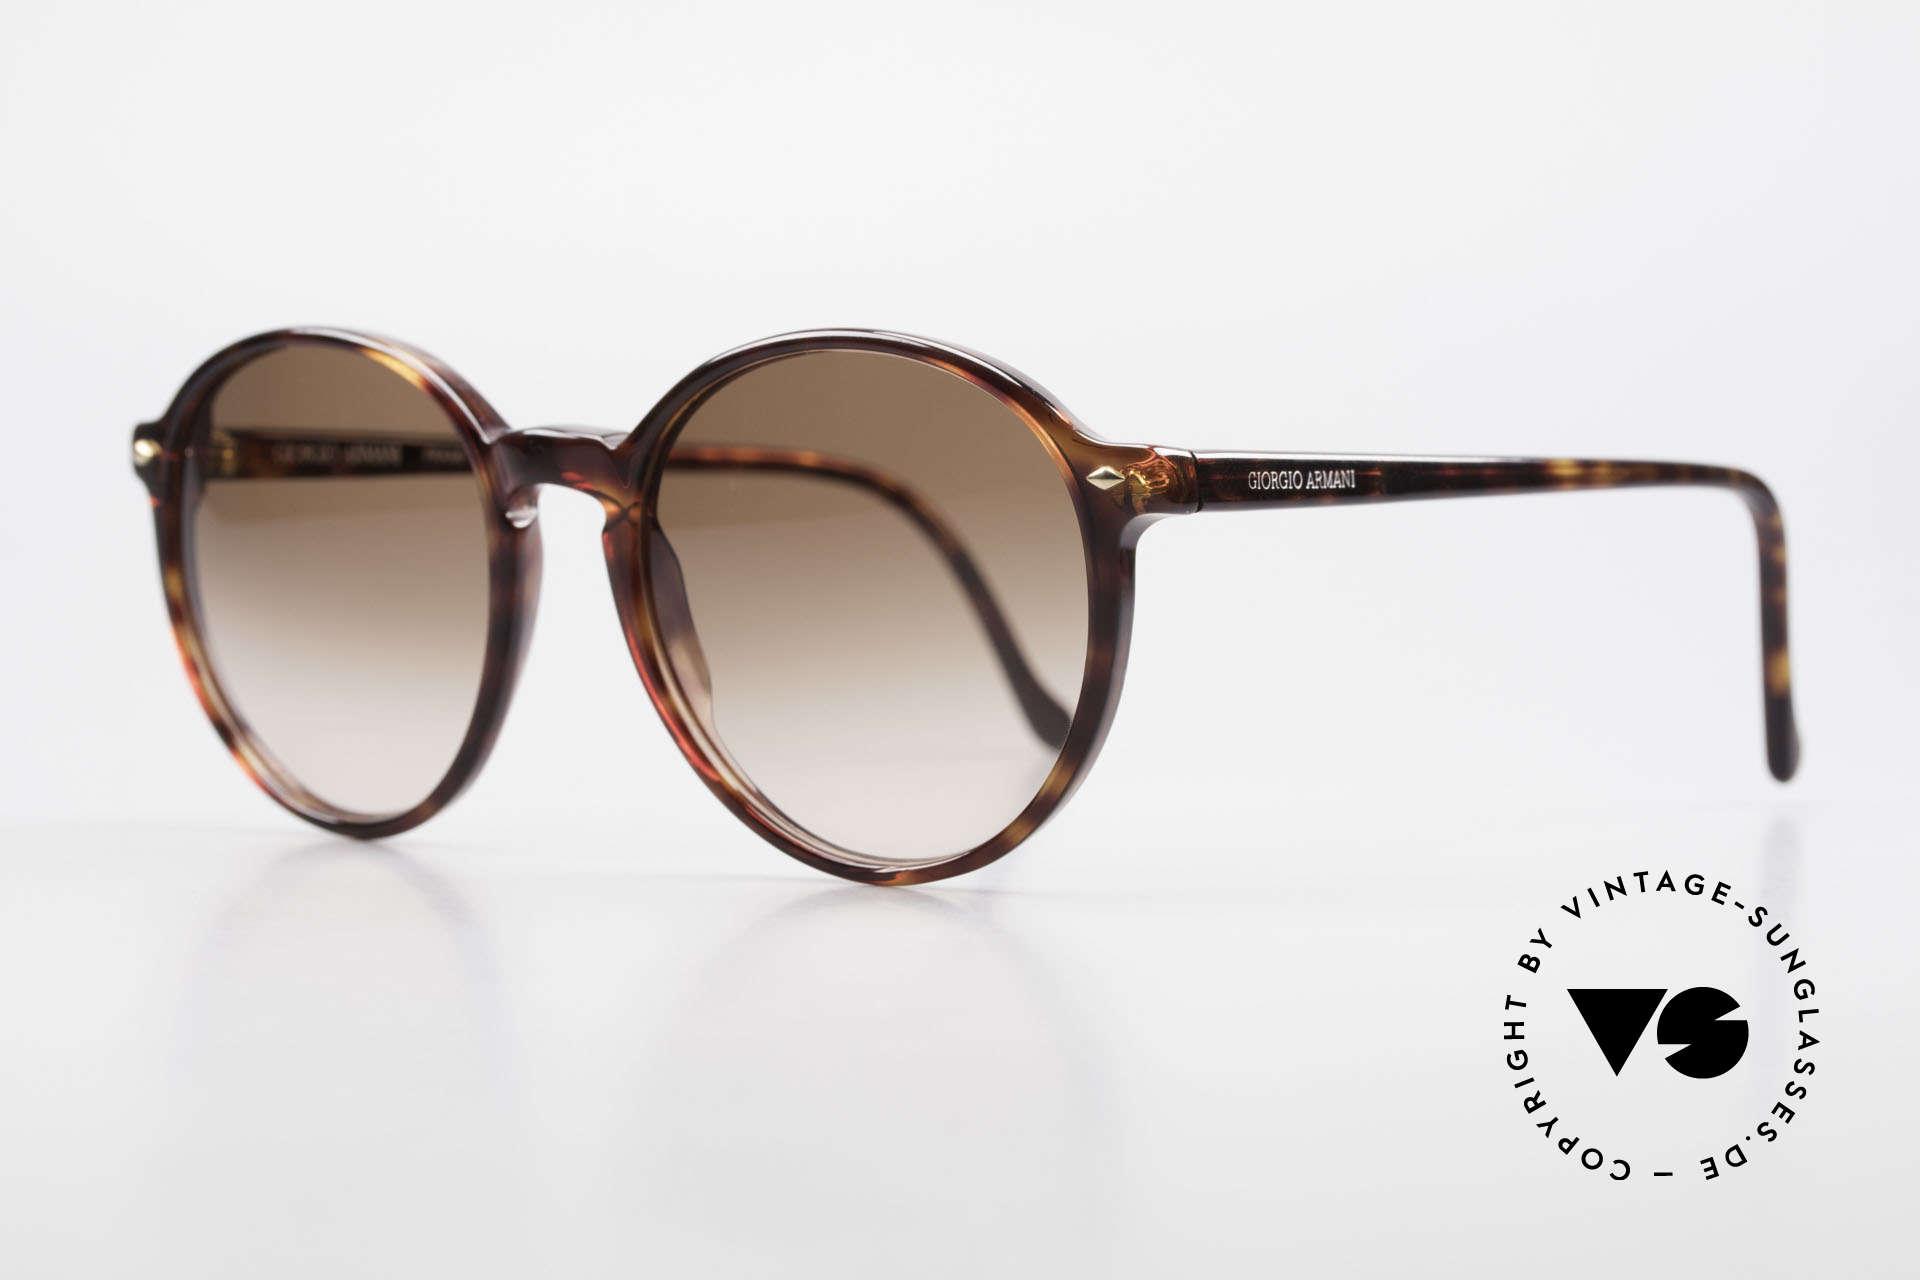 Giorgio Armani 325 No Retro Panto 90's Shades, premium Italian craftsmanship & 100% UV protection, Made for Men